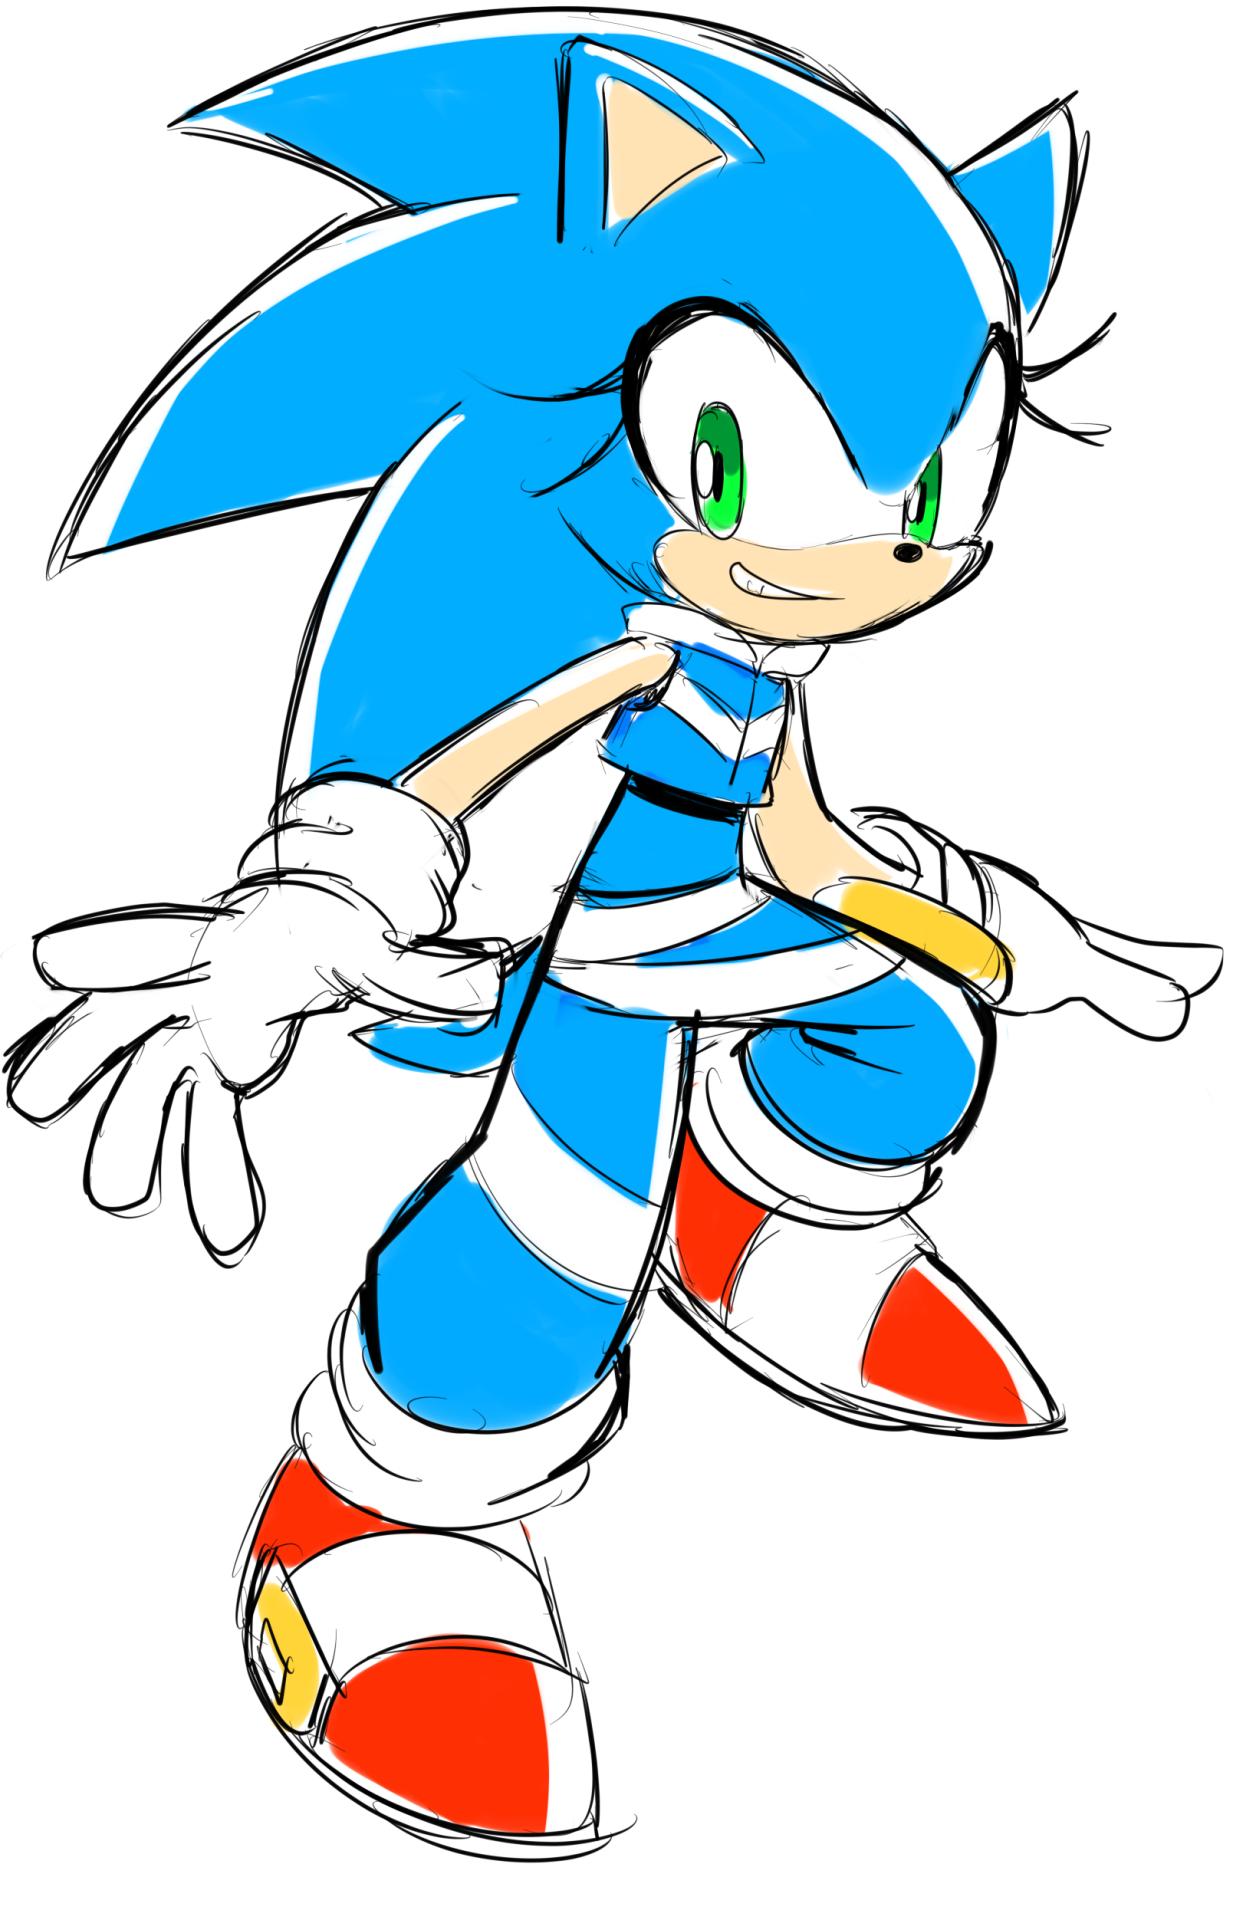 1233x1920 Sonic The Hedgehog Tumblr Sonic Hedgehogs, Sonic